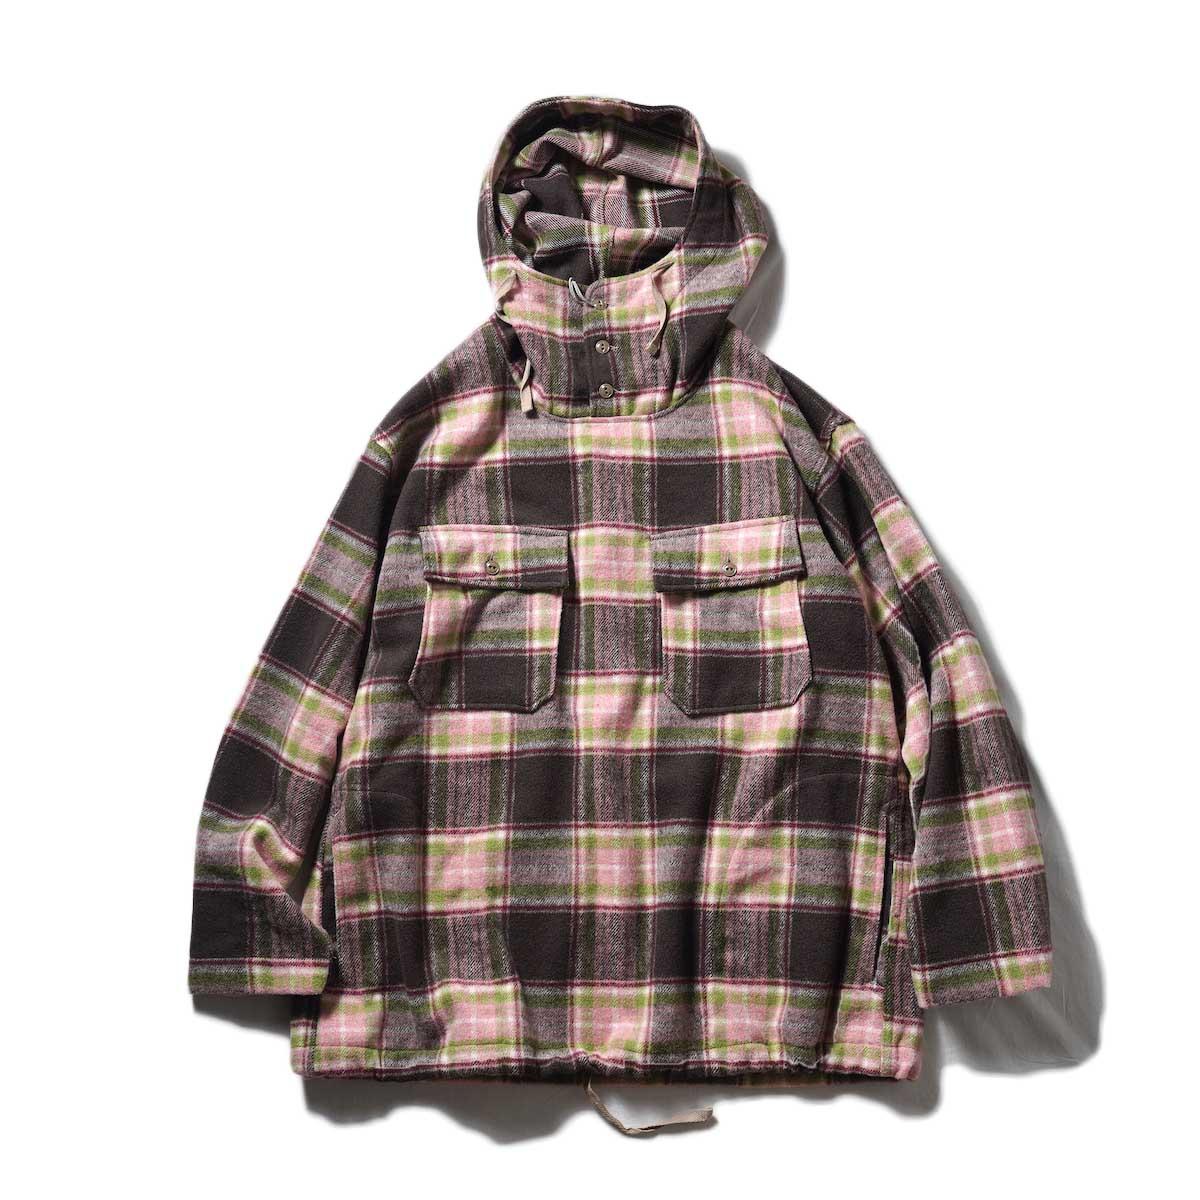 Engineered Garments / CAGOULE SHIRT - POLY WOOL PLAID (Brown / Pink)